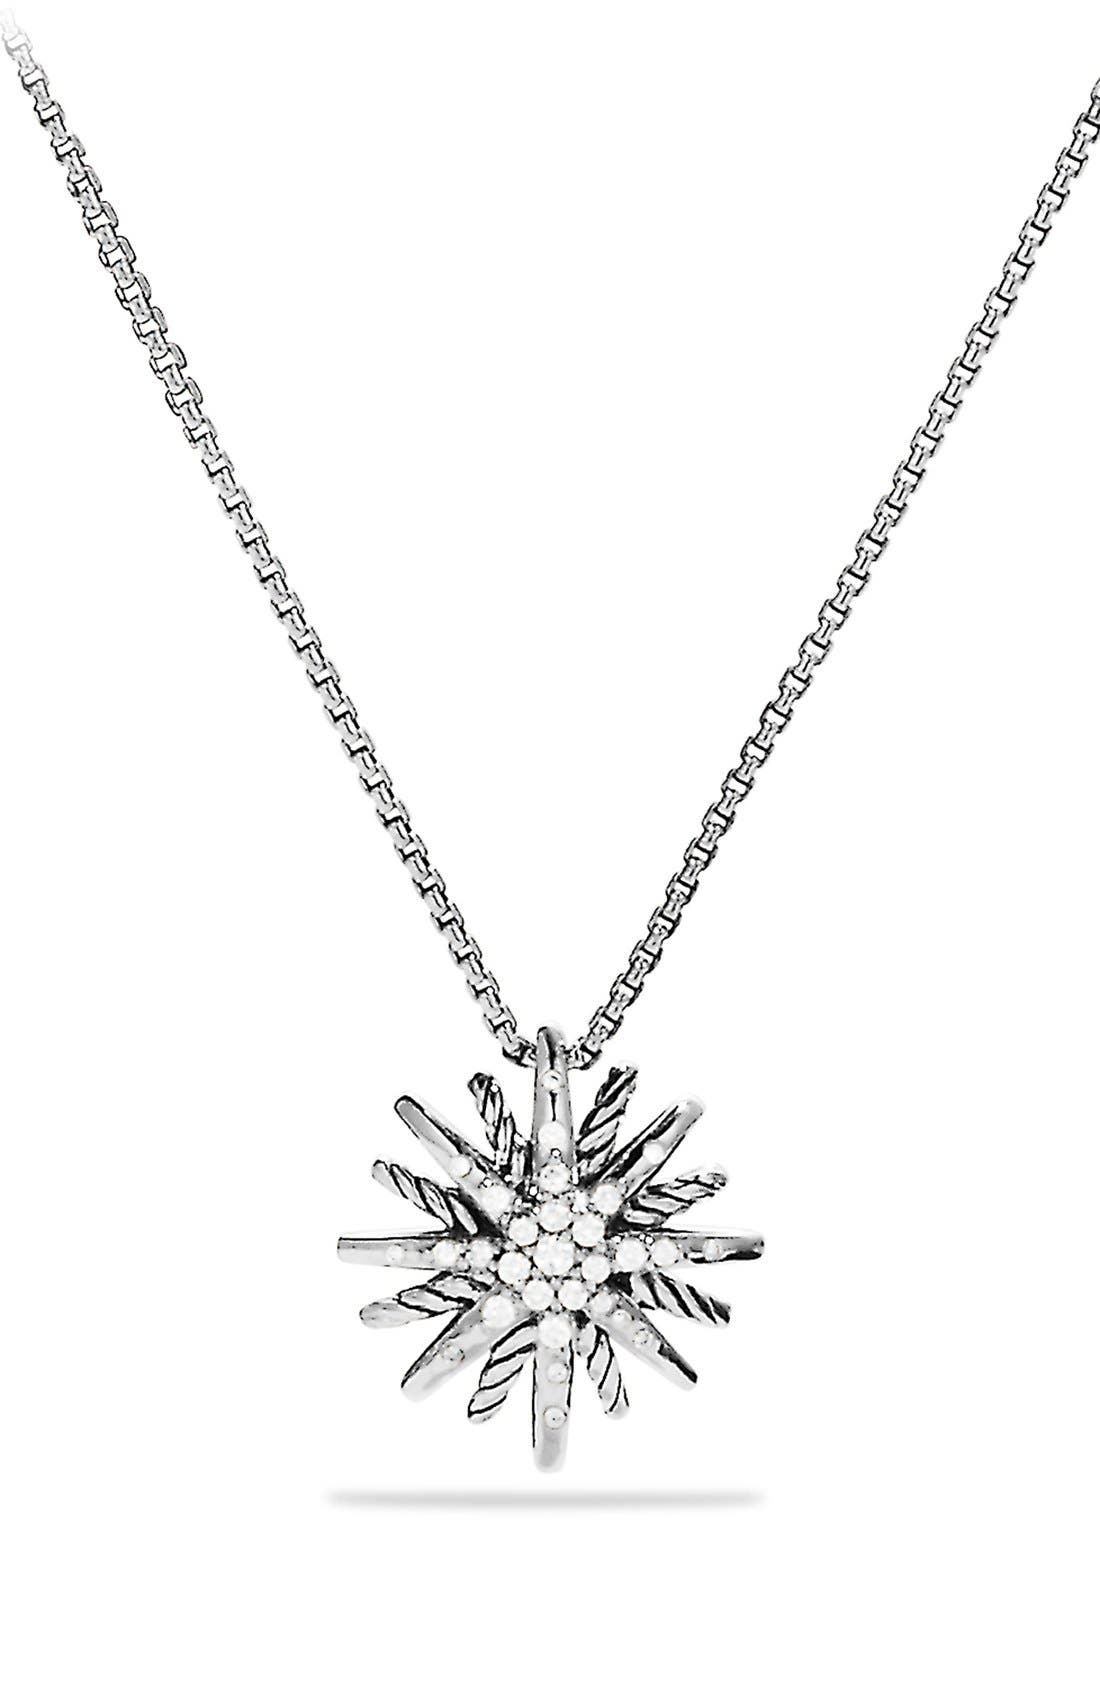 David Yurman 'Starburst' Small Pendant with Diamonds on Chain